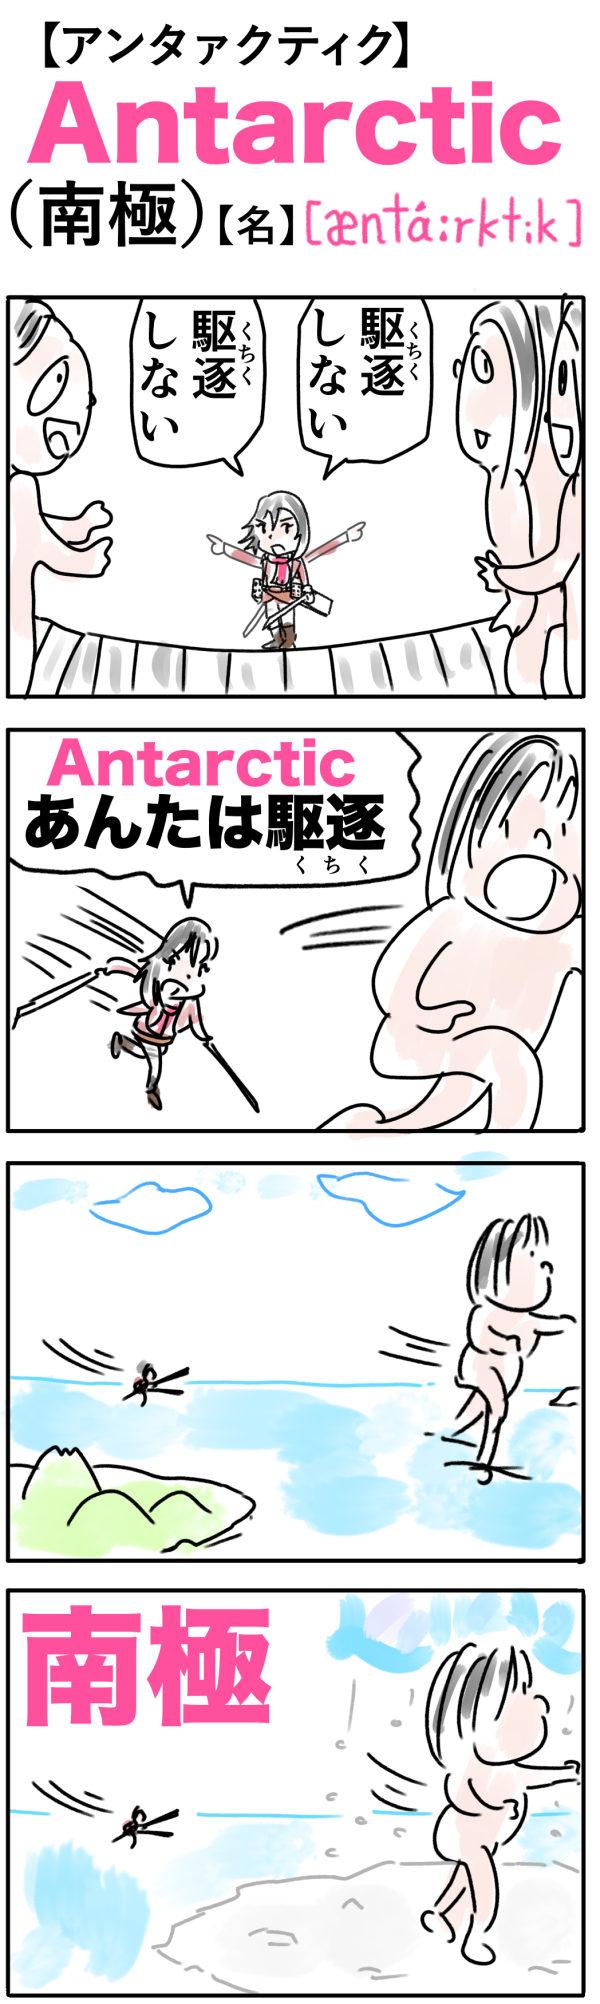 Antarctic(南極)の語呂合わせ英単語